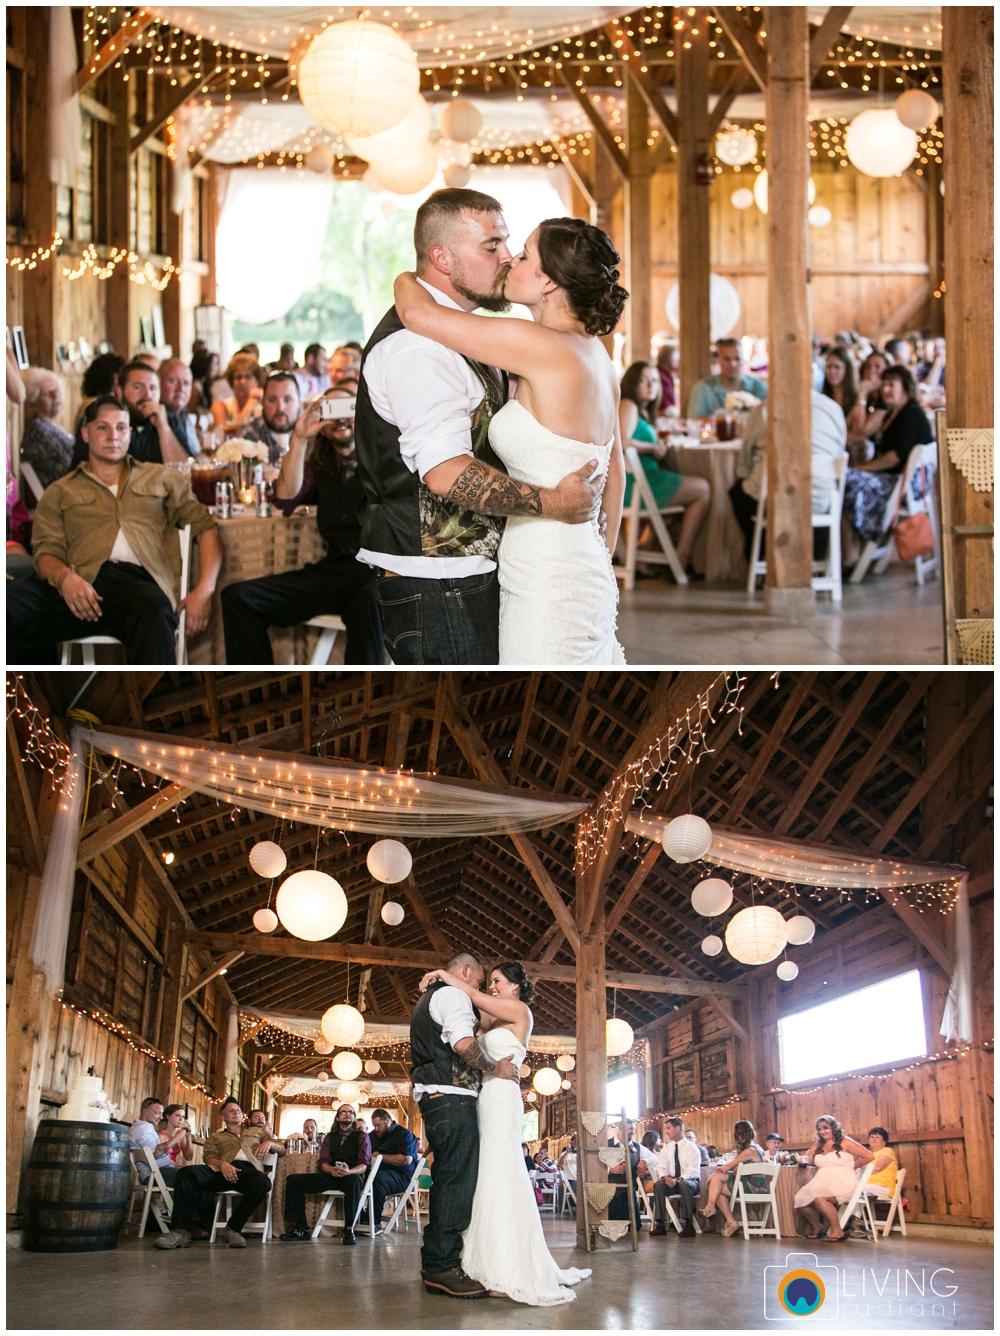 shannon-bill-bowers-wedding-living-radiant-photography-union-mills-homestead_0024.jpg